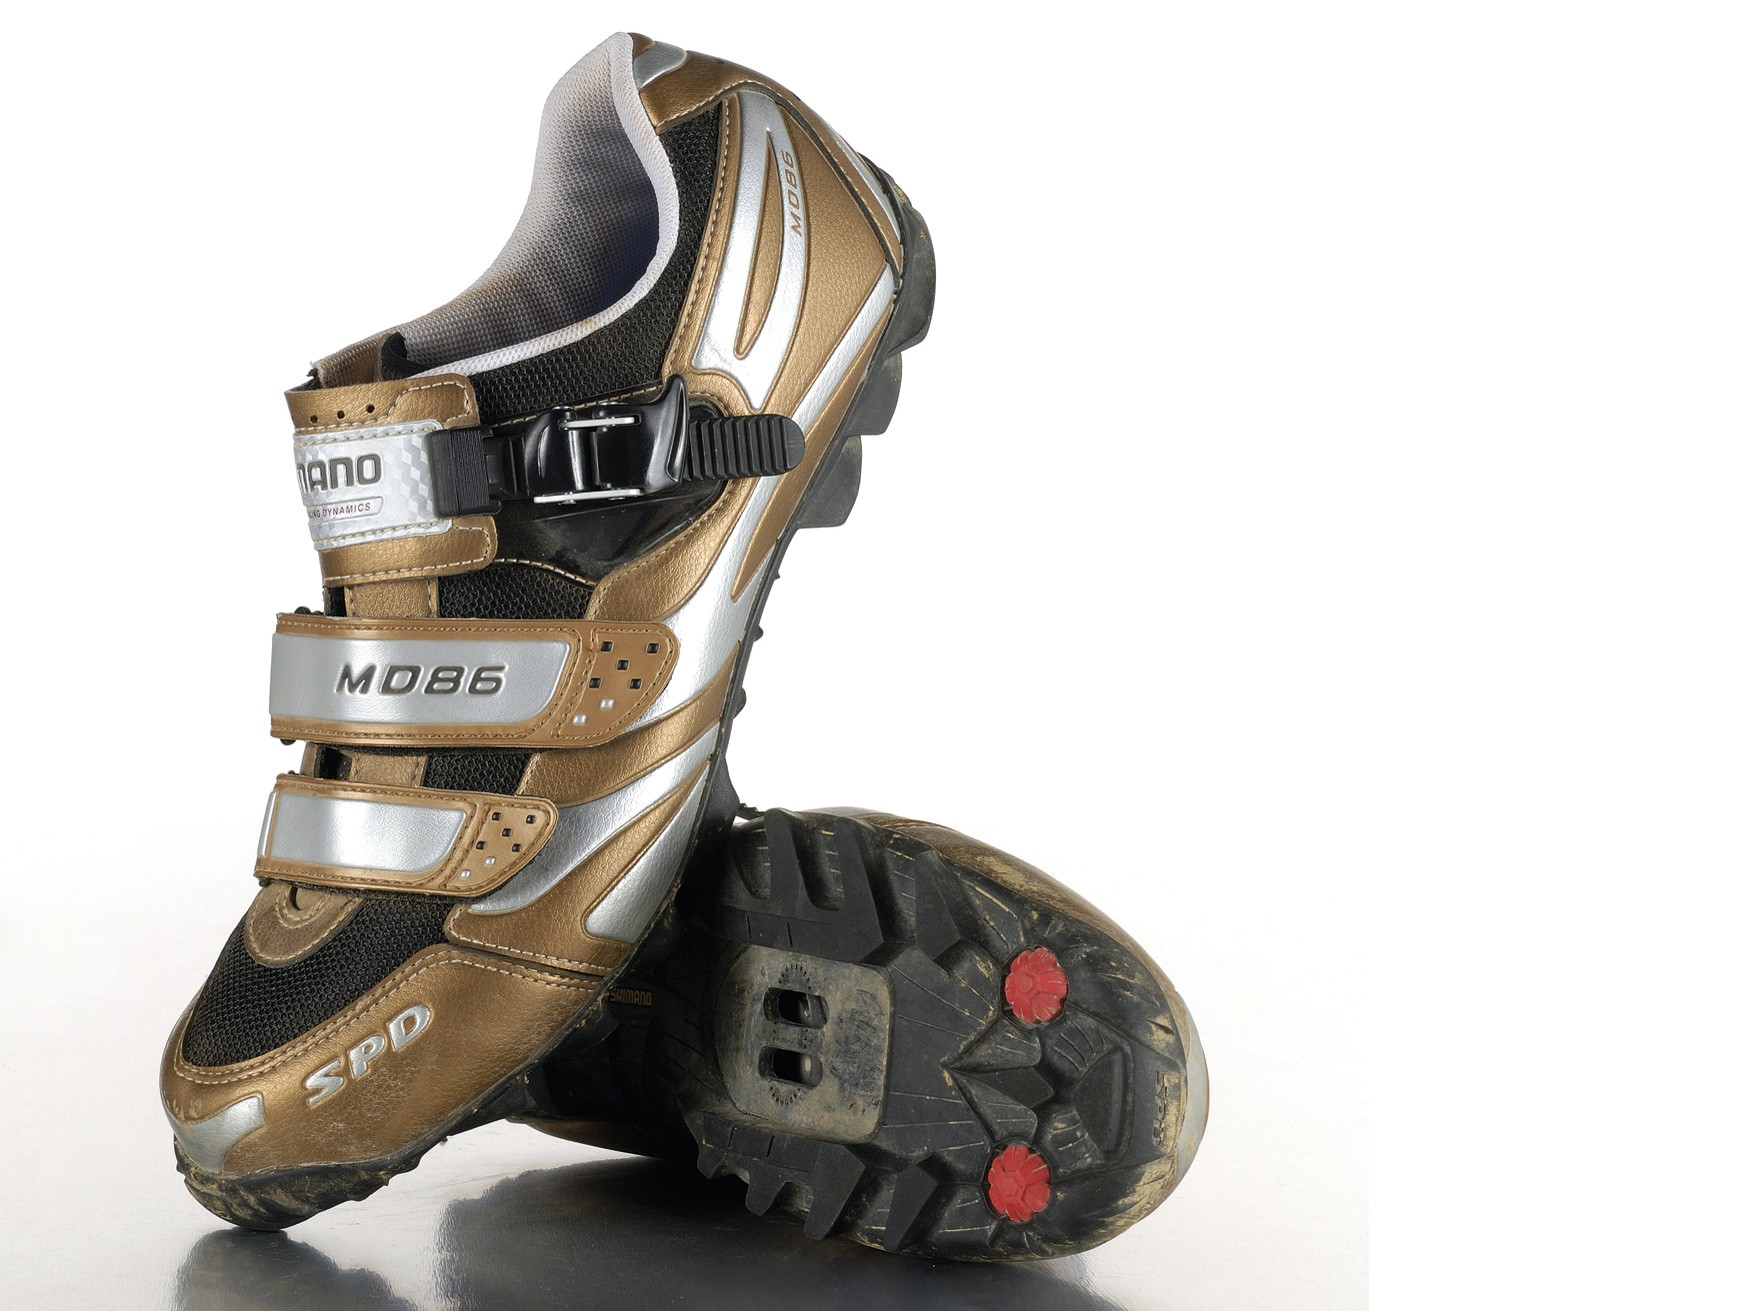 Shimano M086 shoes